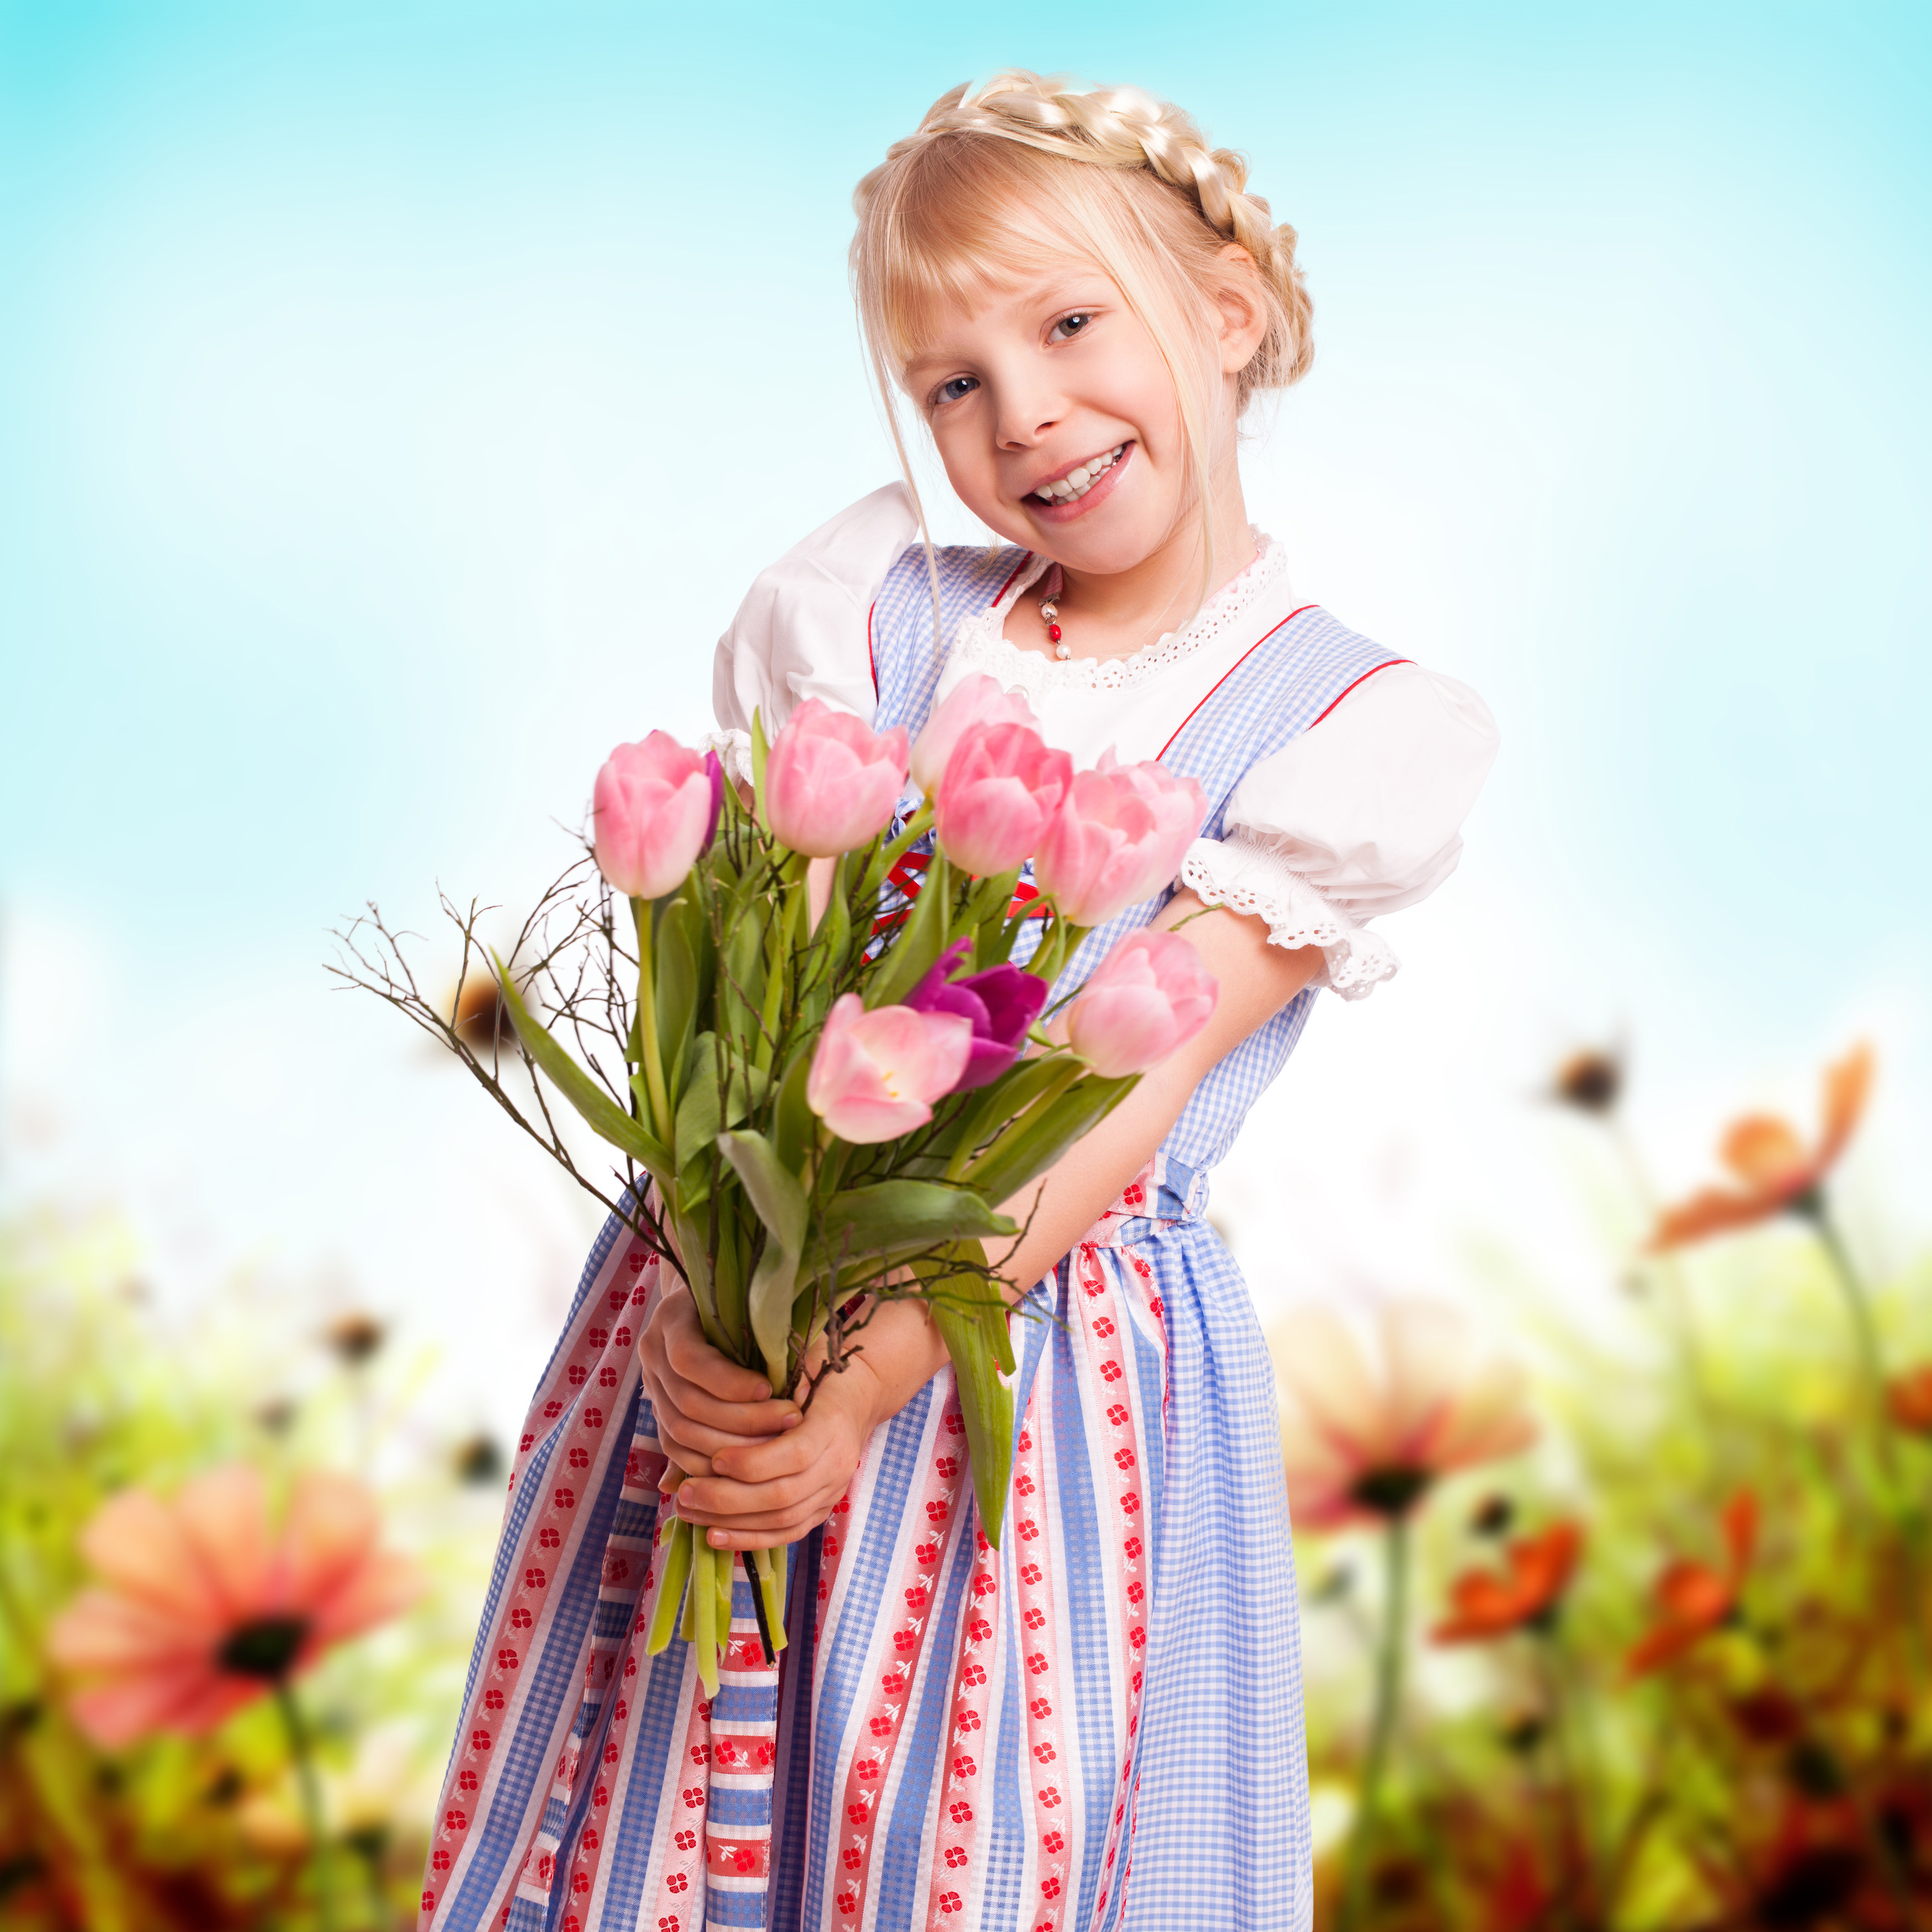 Картинки как девочка дарит цветы